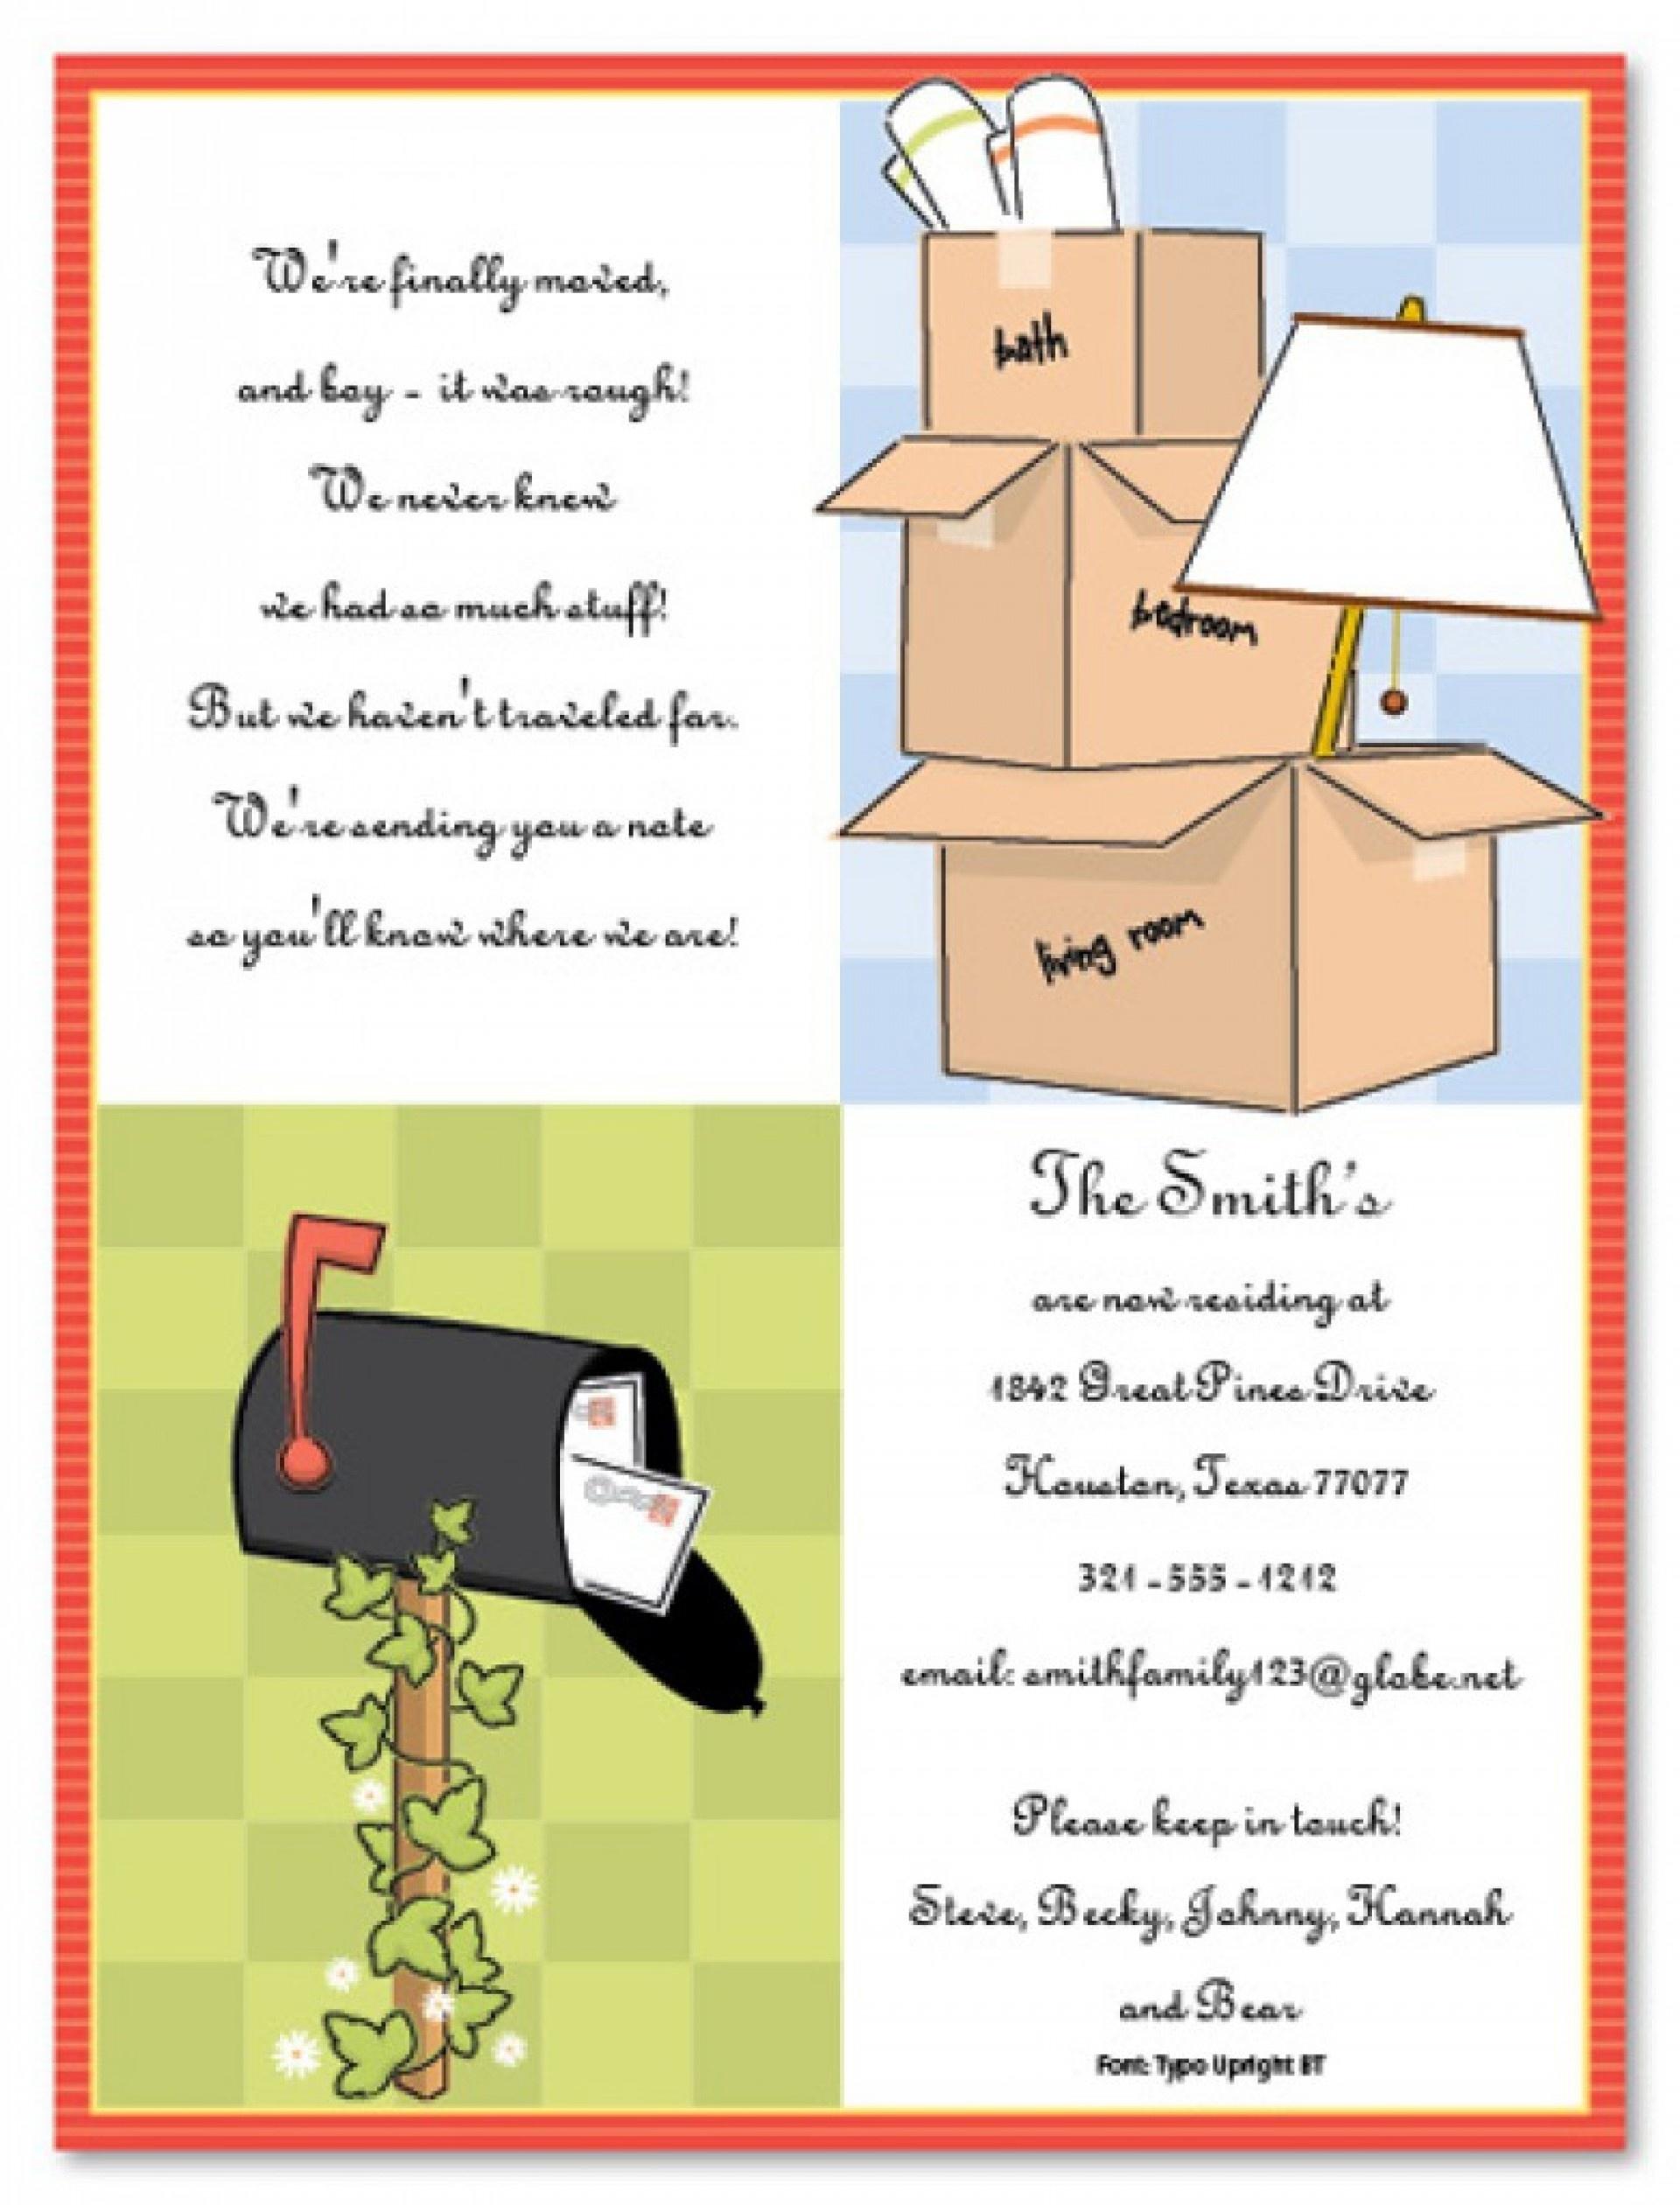 020 Housewarmingitations Templates Free Printable Is The Best Way To - Free Printable Housewarming Invitations Cards